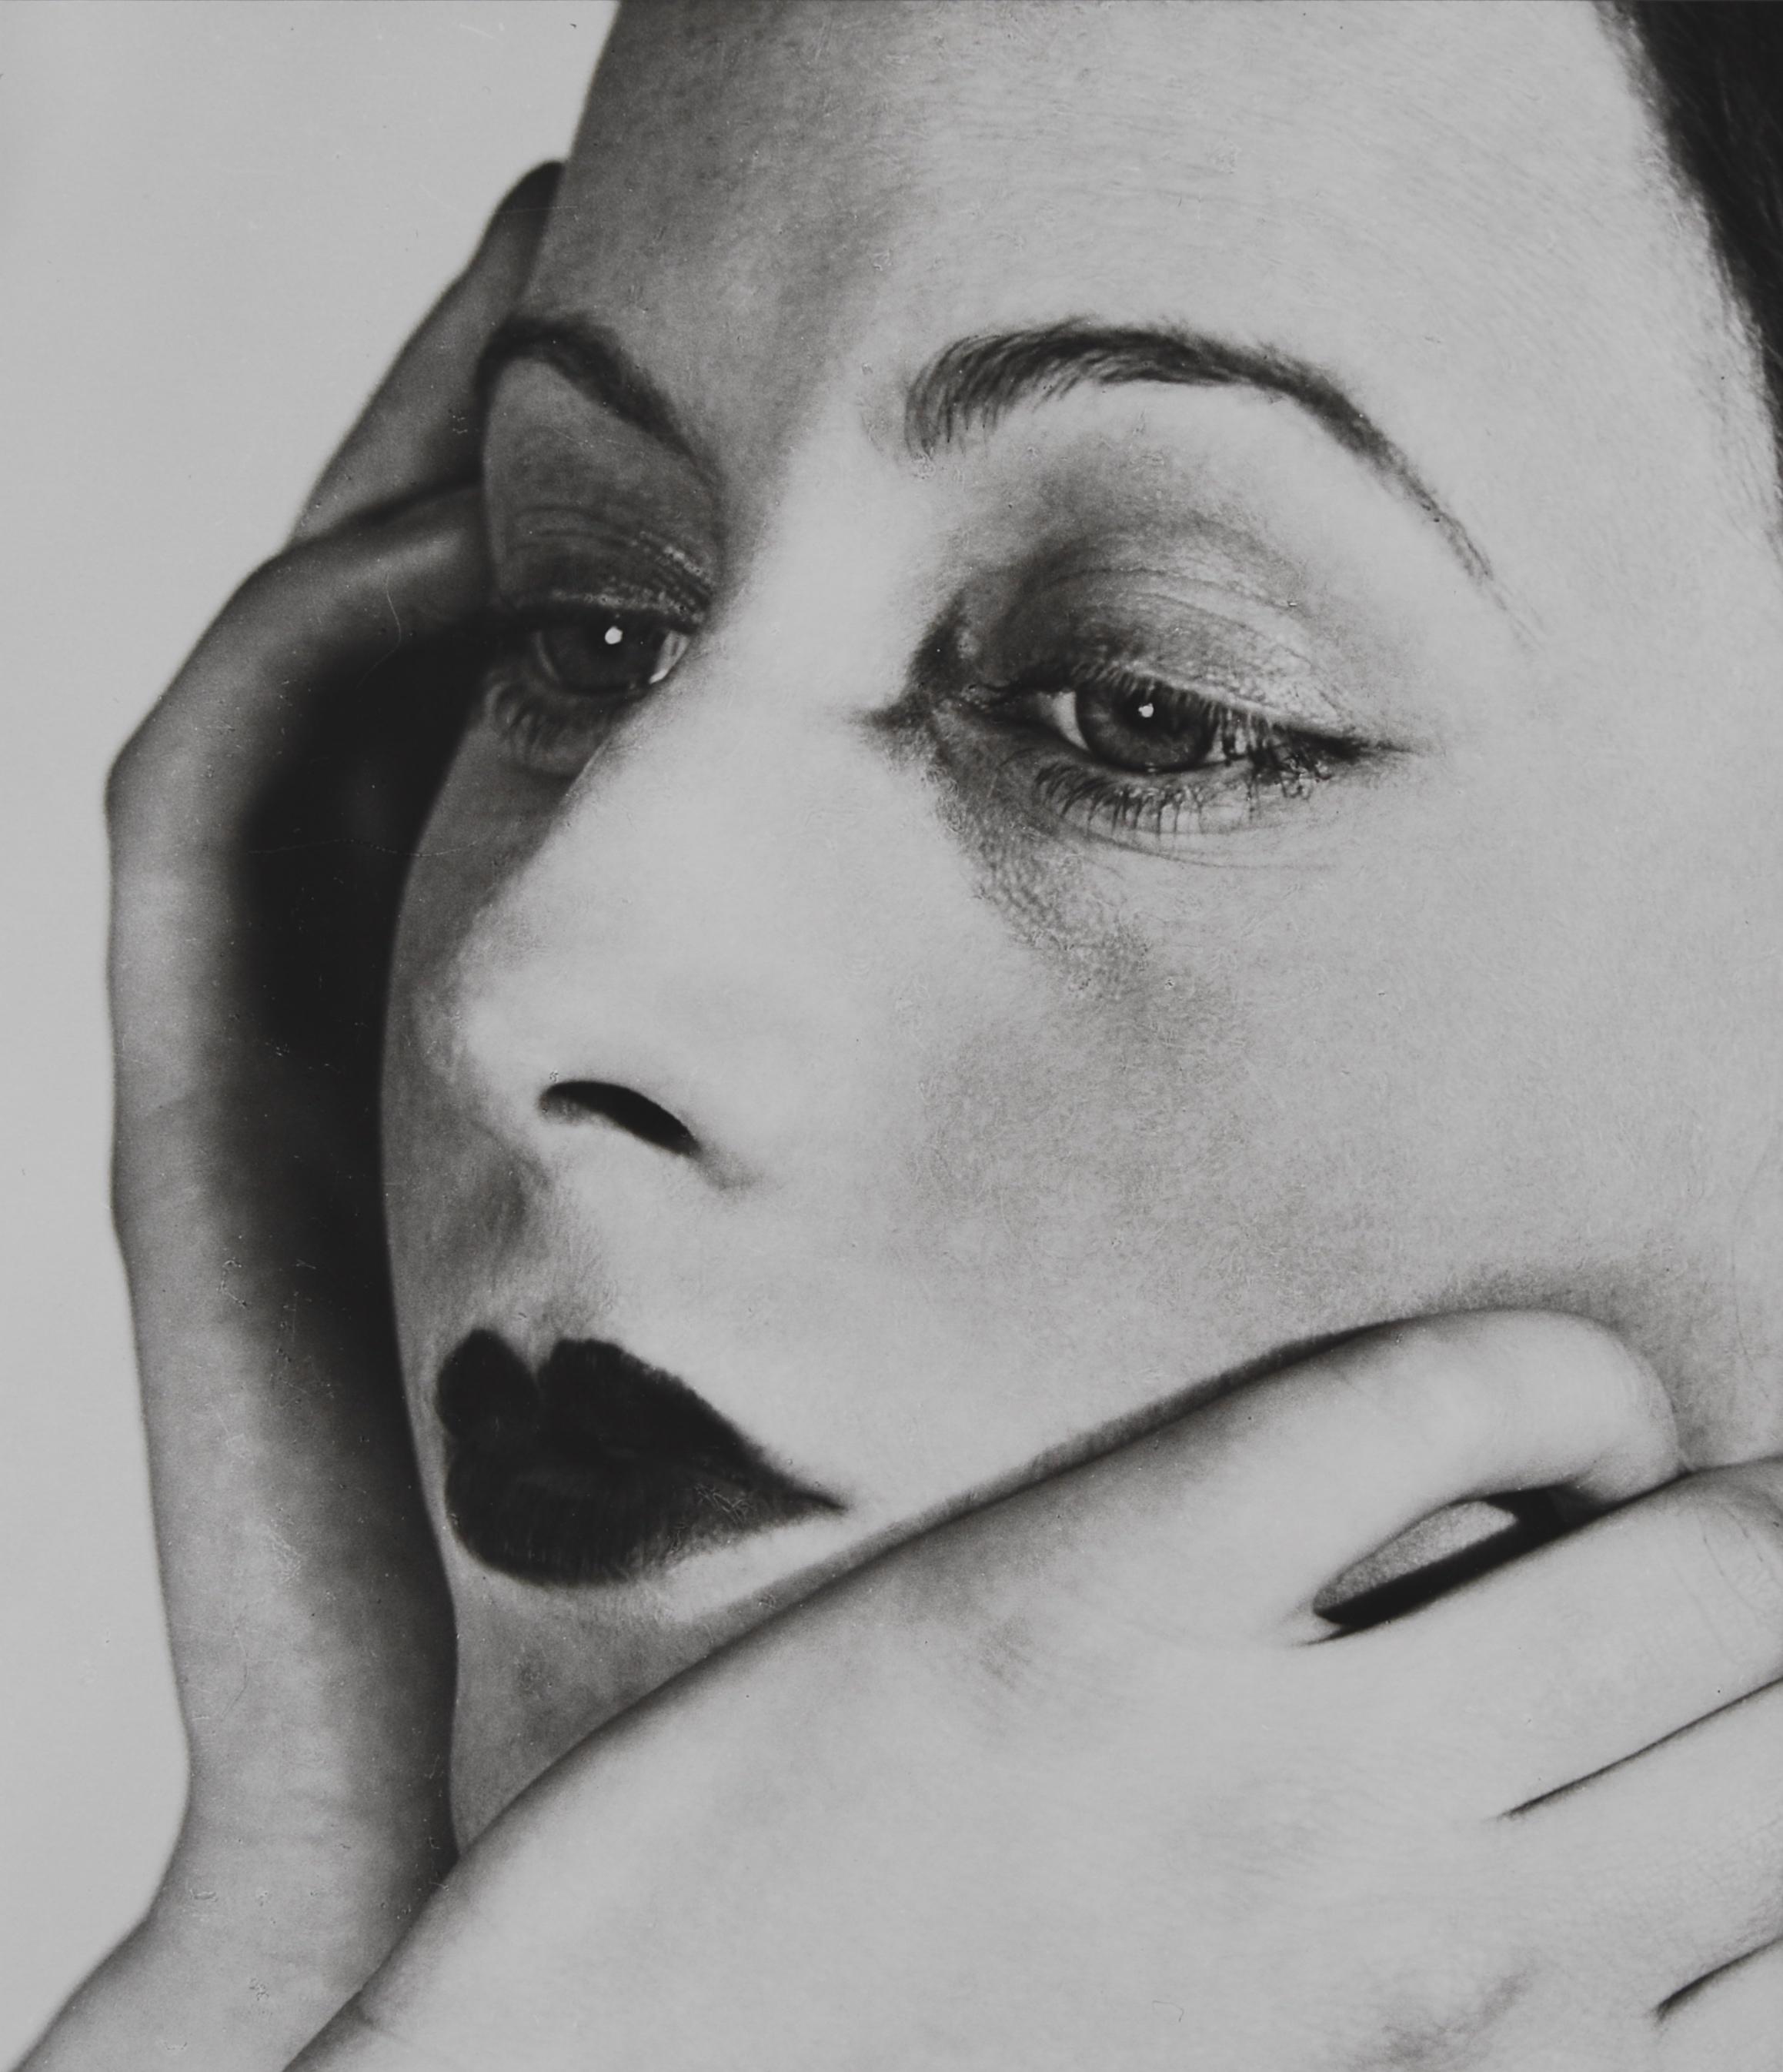 Florence Henri, Portrait composition, Cora, 1931, Florence Henri © Galleria Martini & Ronchetti, courtesy Archives Florence Henri